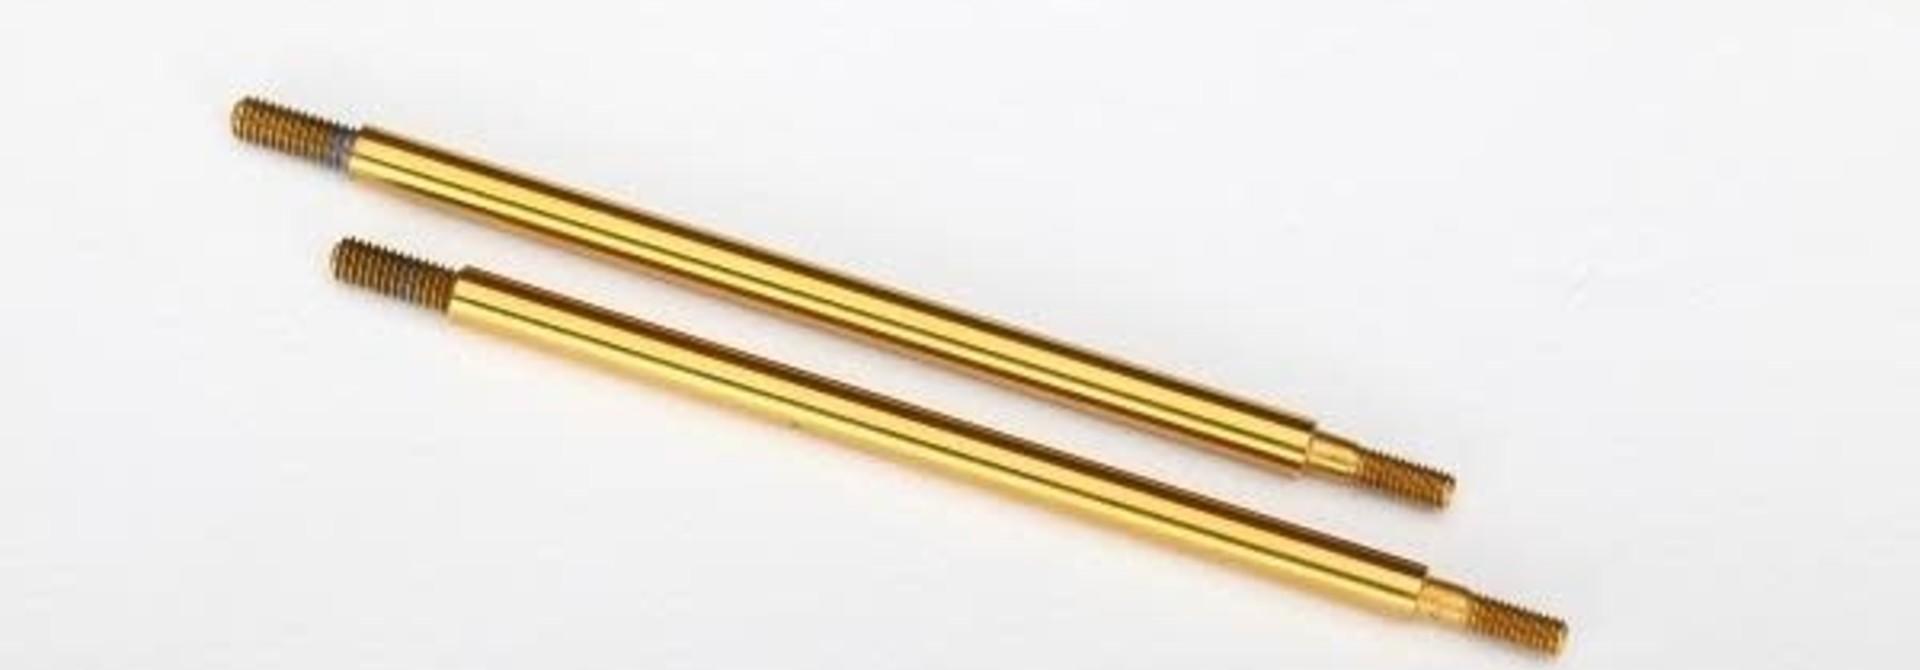 8463T - Shock shaft, 74mm (GTR) (rear) (TiN-coated) (2)